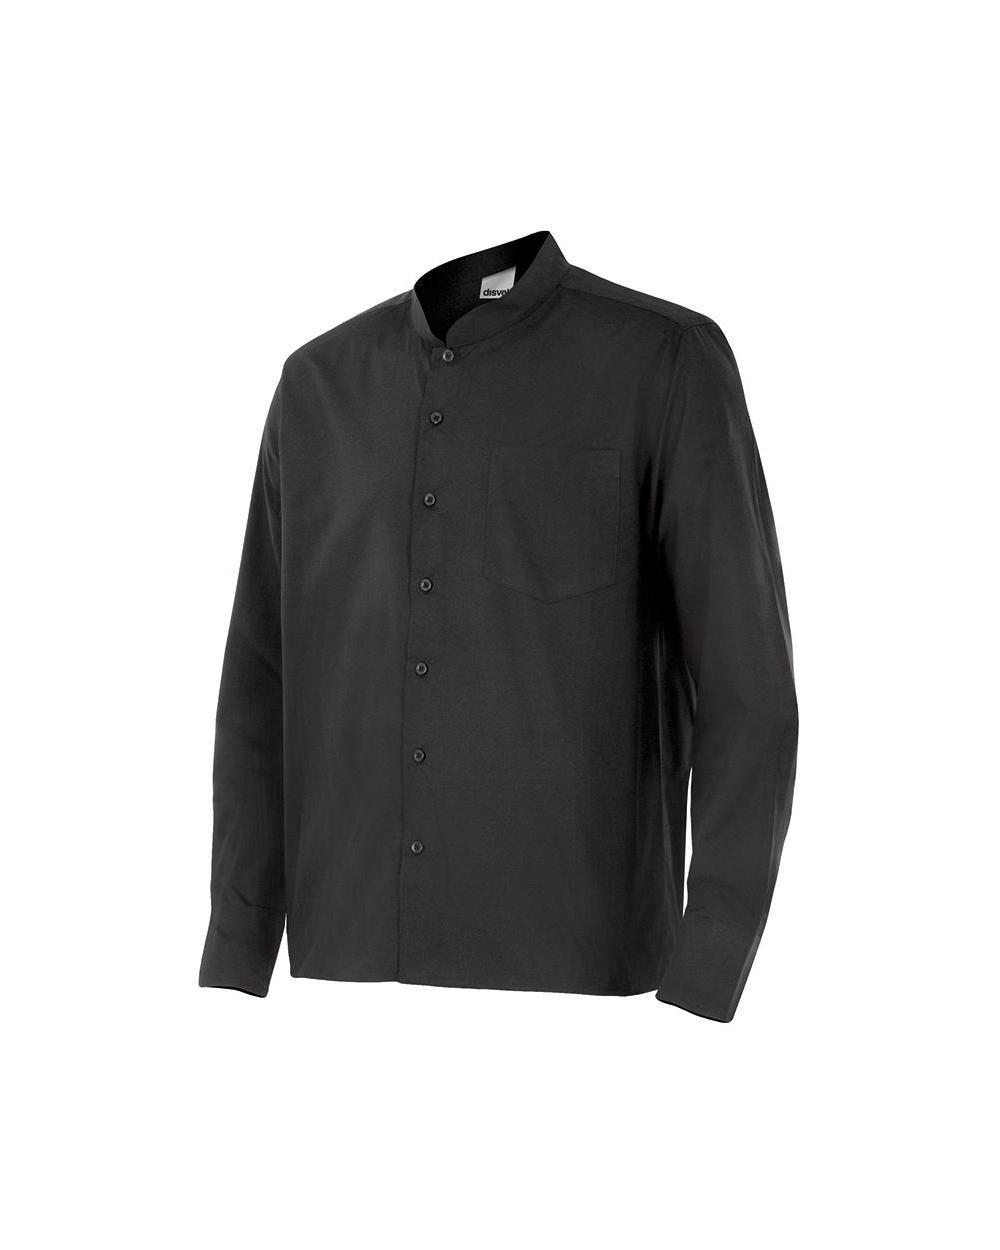 Comprar Camisa con cuello mao serie listan online barato Negro